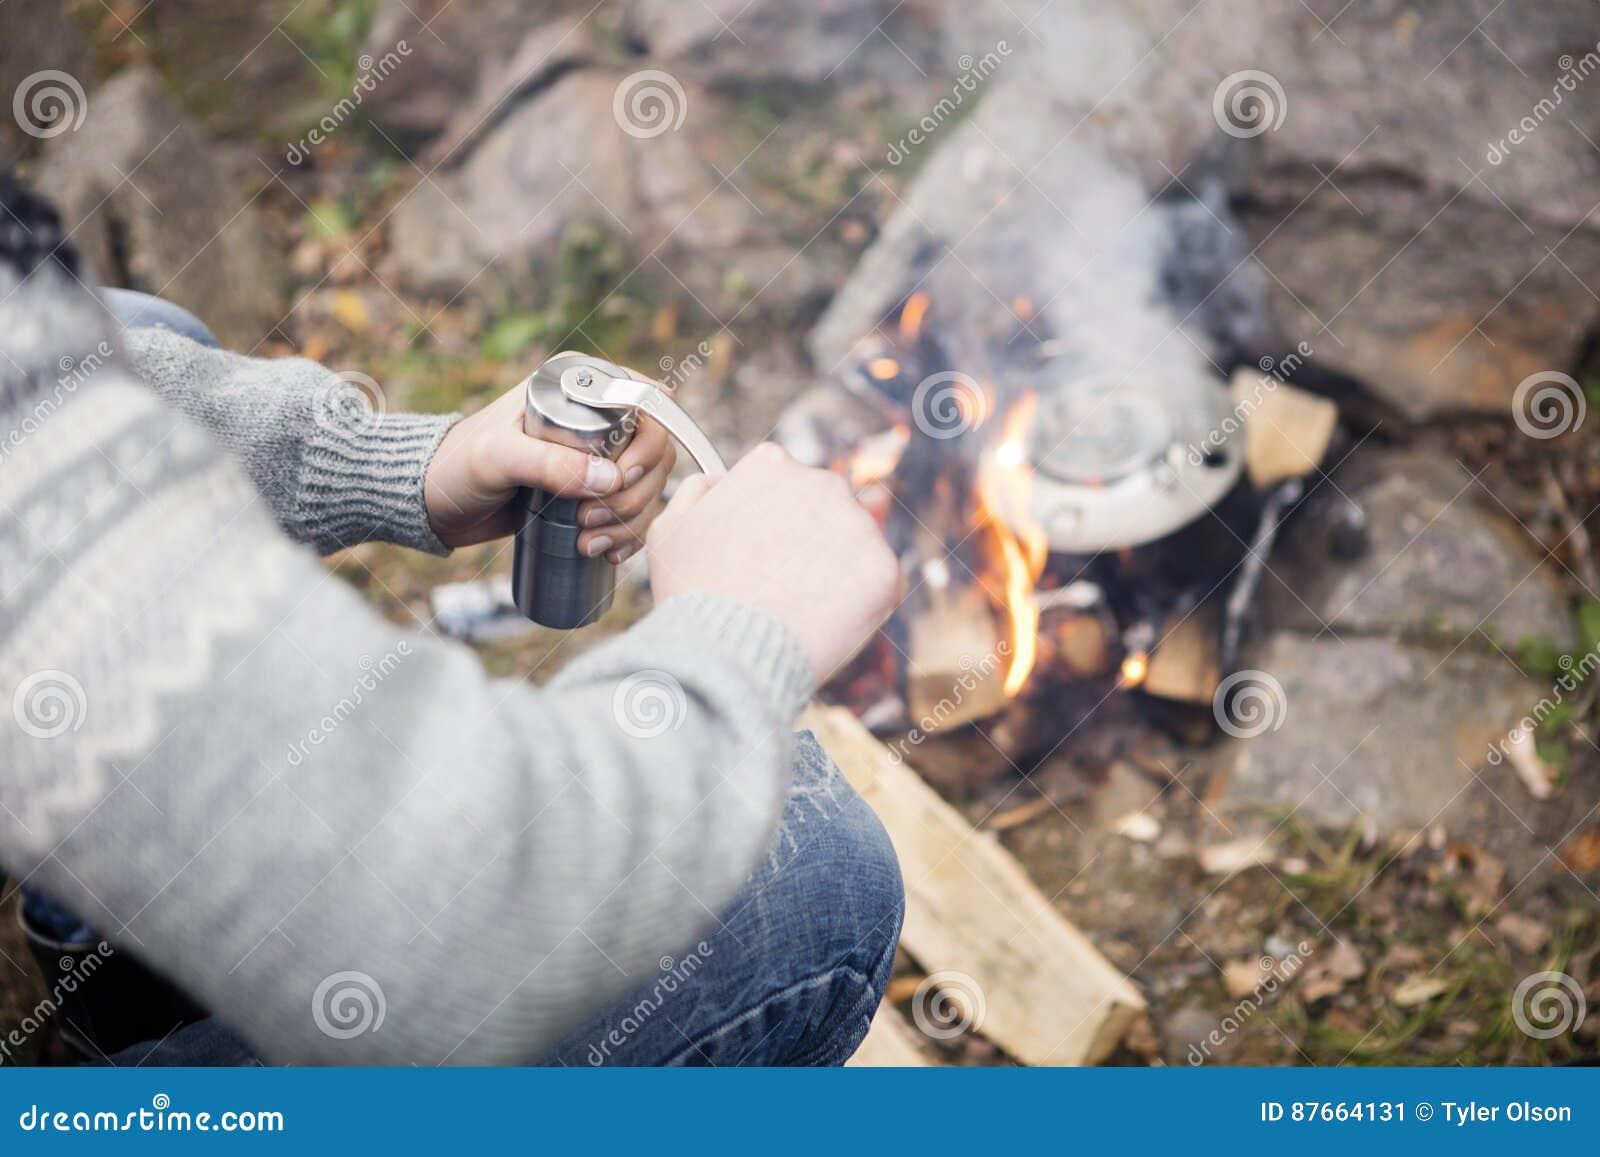 Man Grinding Coffee Near Bonfire At Campsite